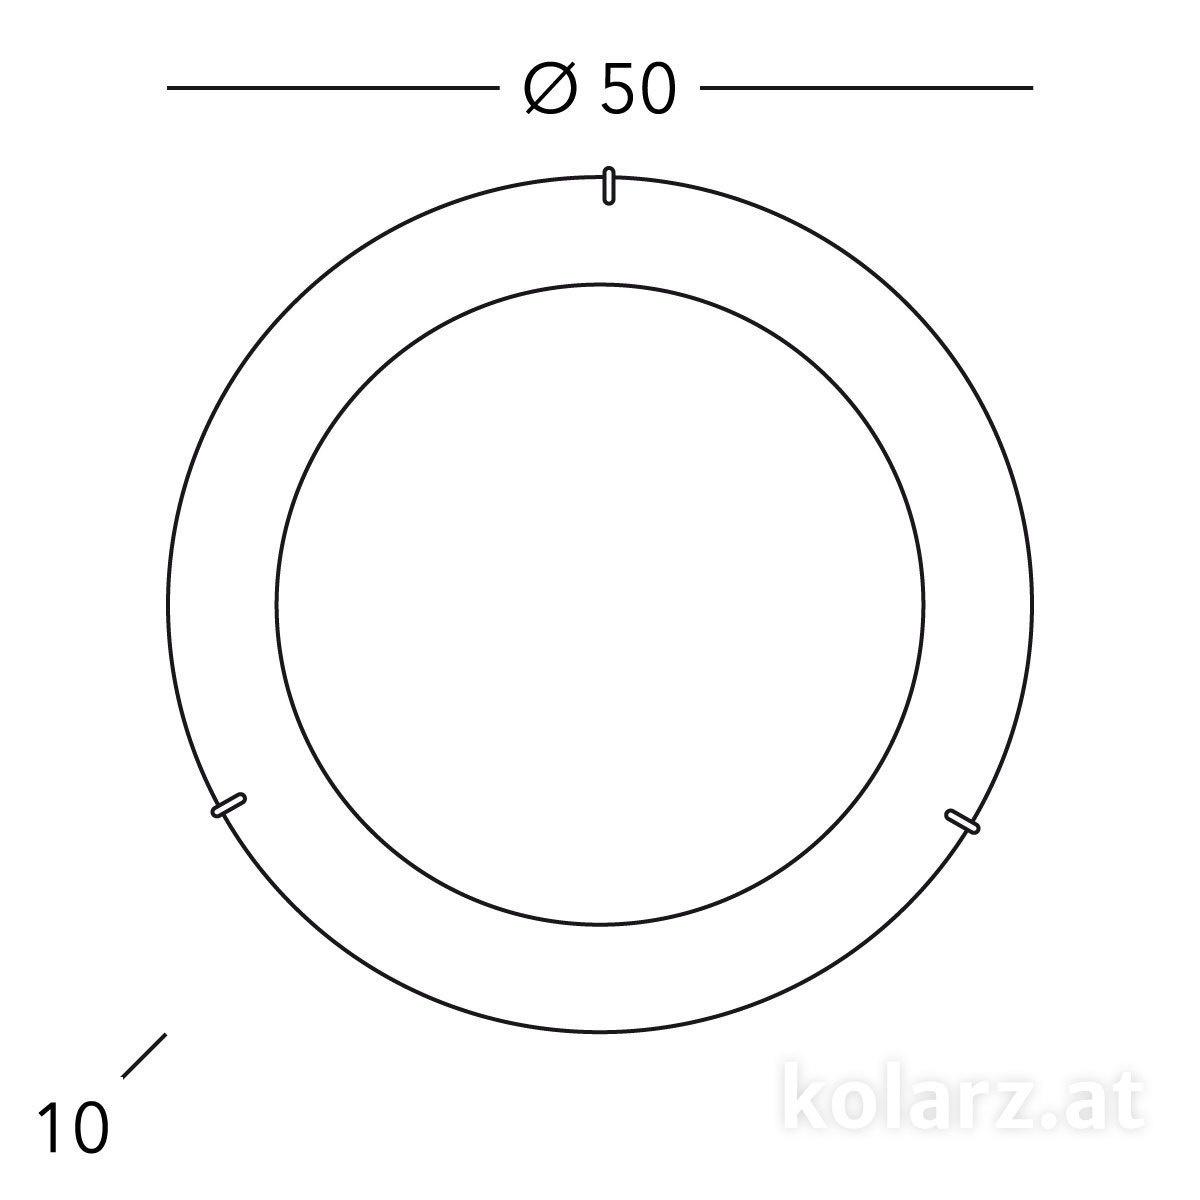 0424-U14-3-Cu-s1.jpg